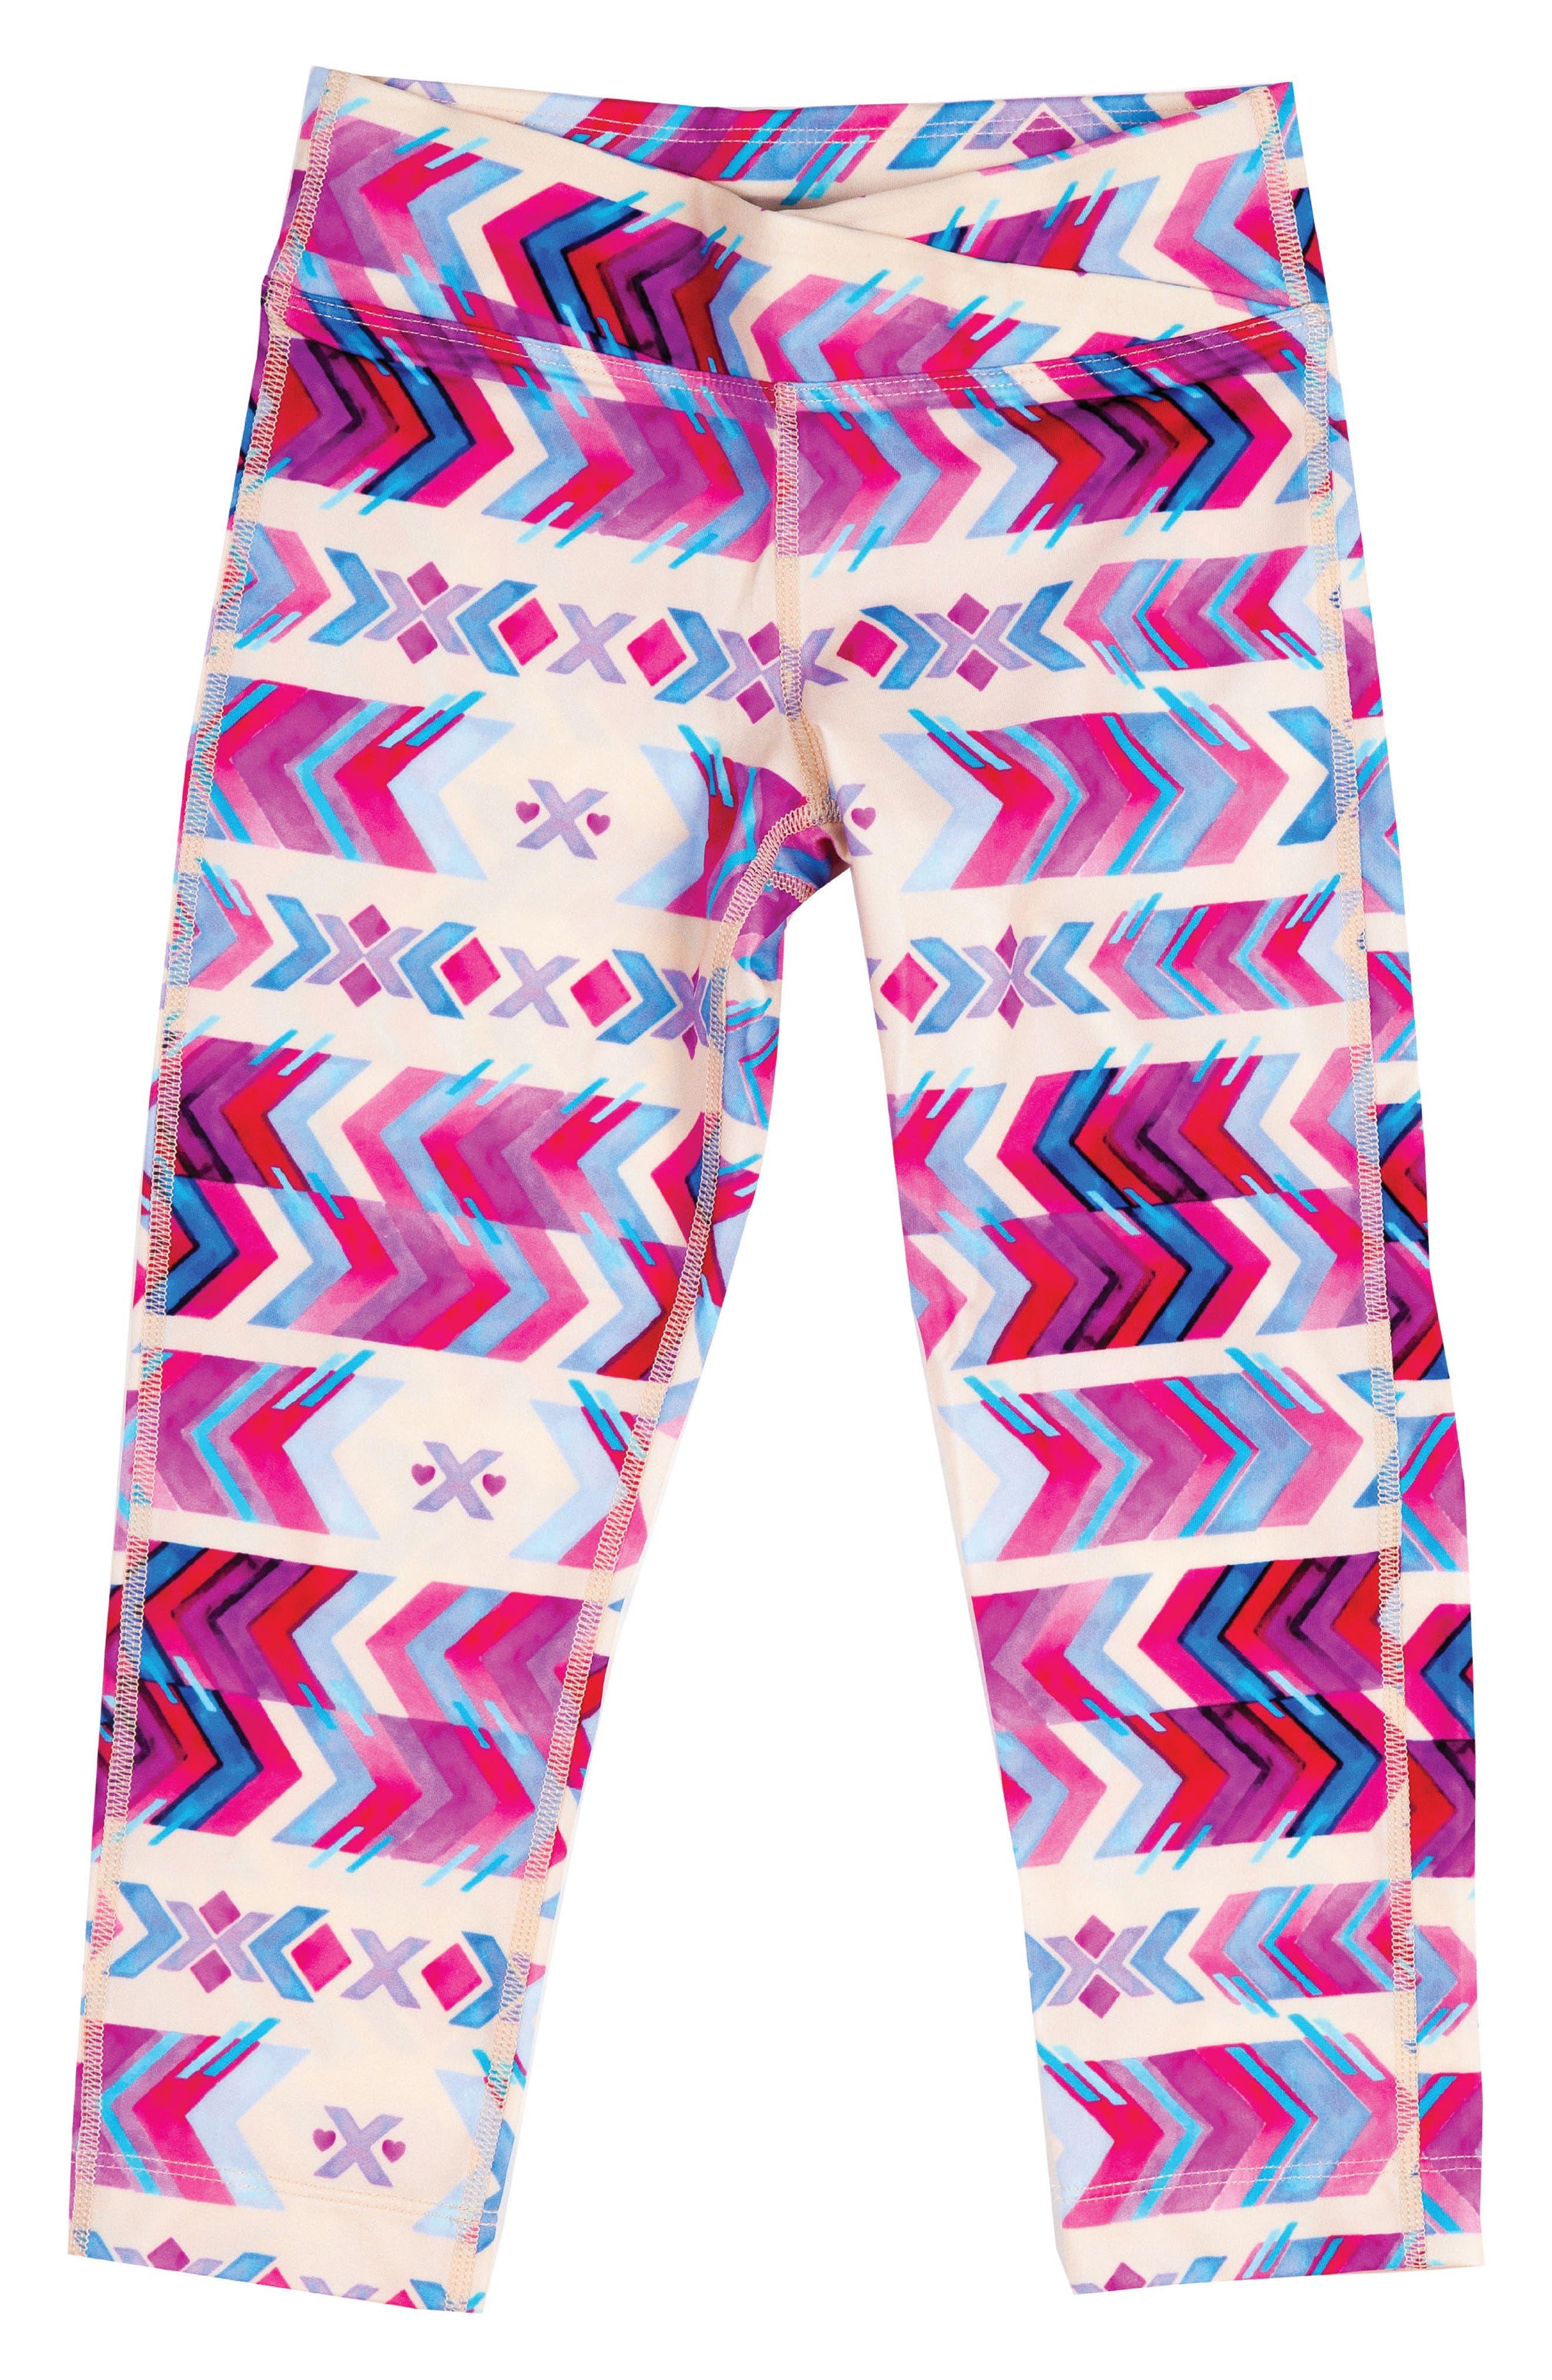 Surf's Up Swim Leggings,                         Main,                         color, Cream/ Pink Aztec Print